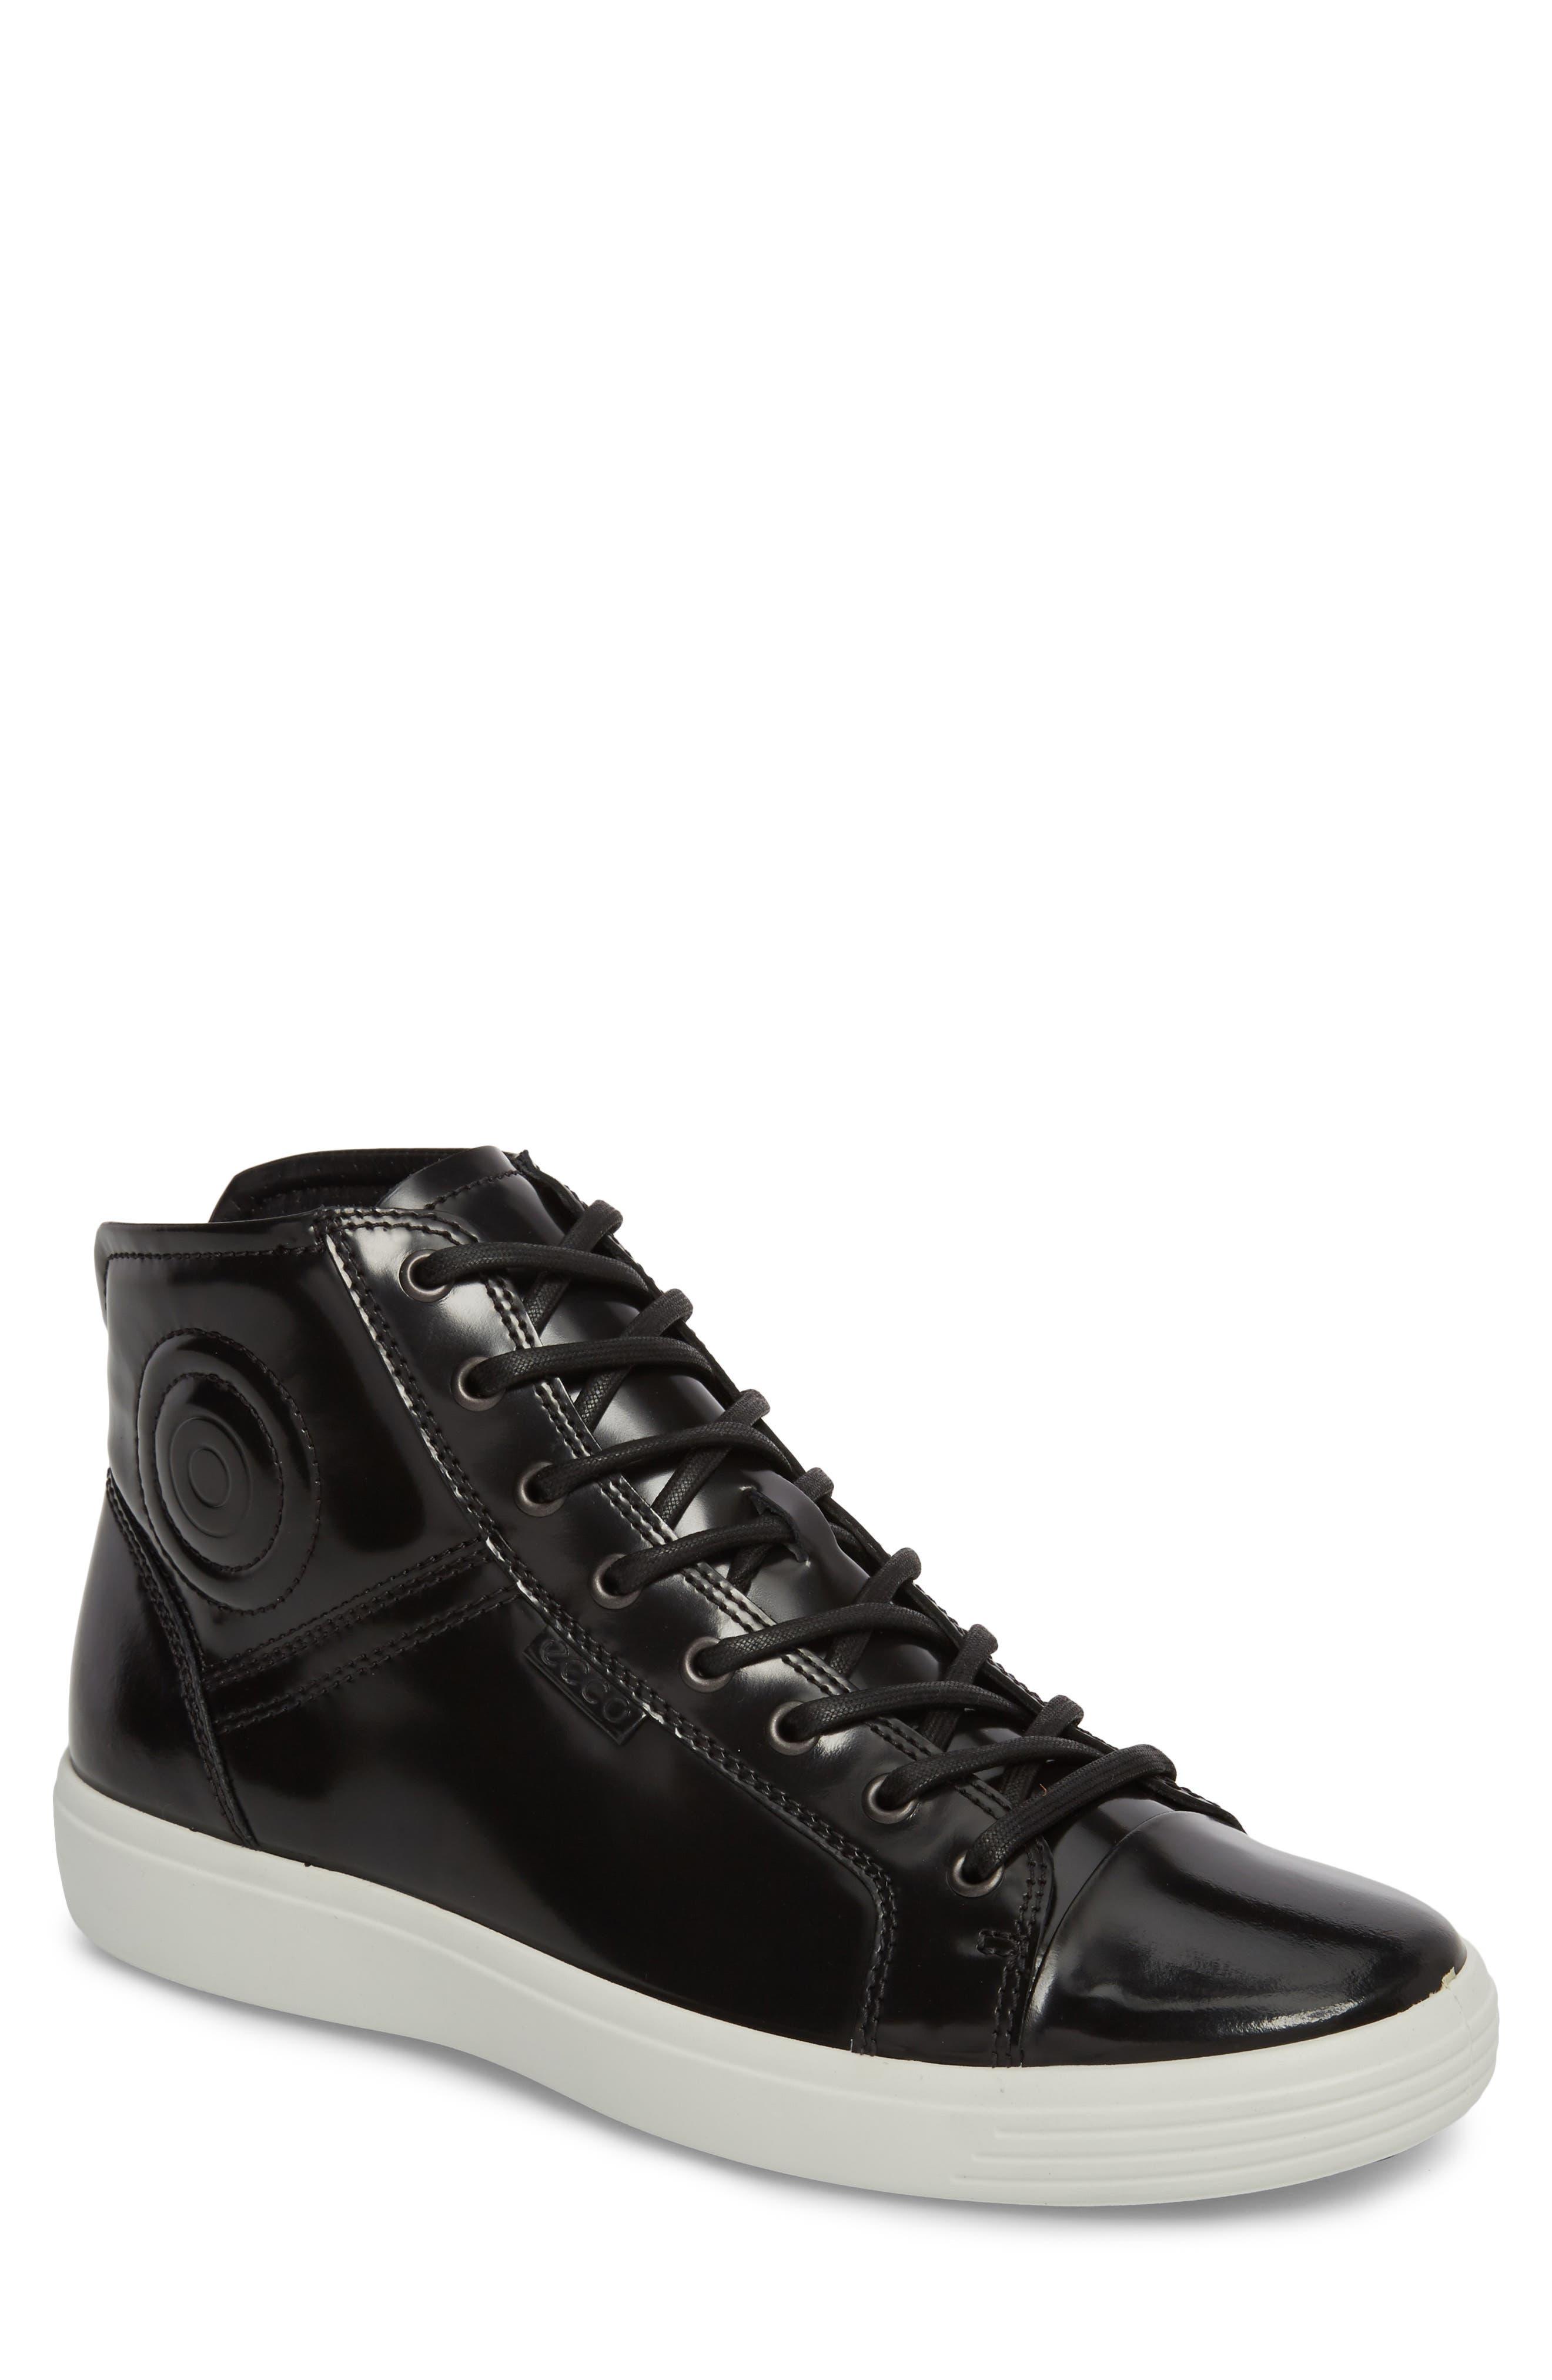 Soft 7 Premium High Top Sneaker,                             Main thumbnail 1, color,                             Black Leather